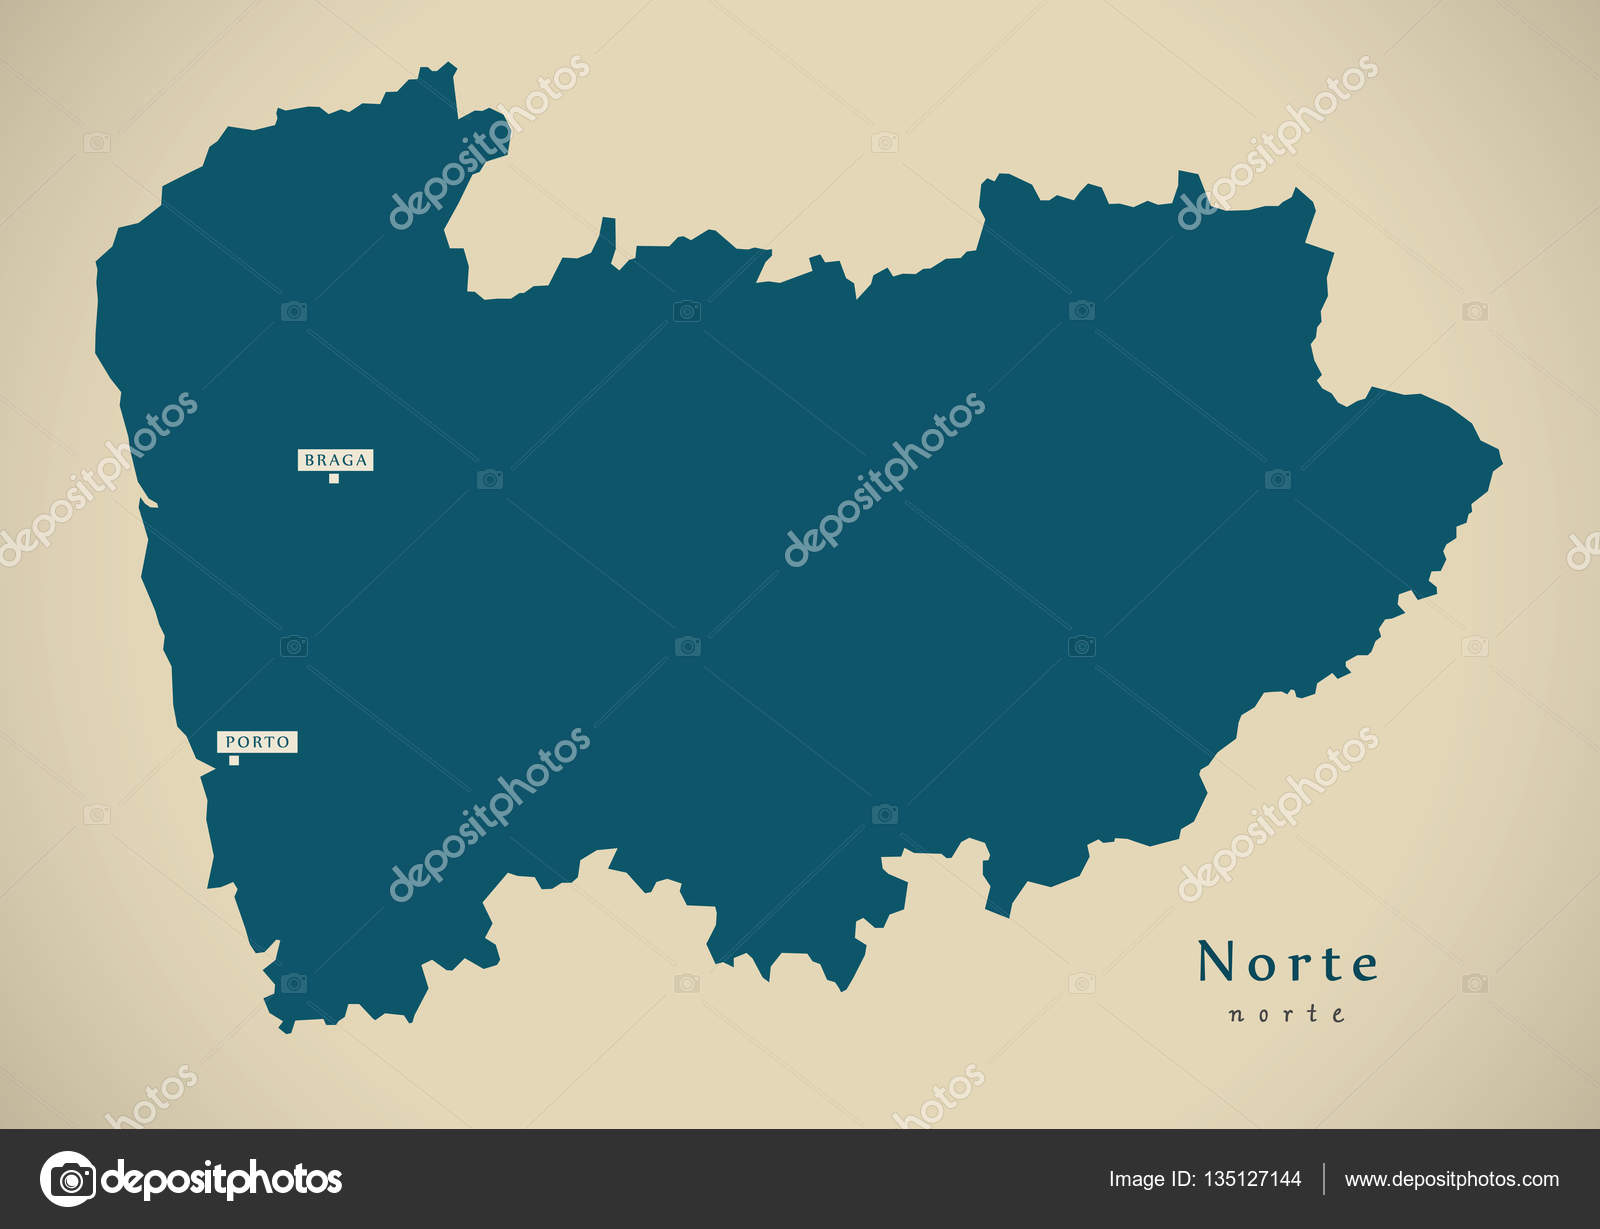 Norte De Portugal Mapa.Moderno Mapa Norte Portugal Pt Stock Photo C Ingomenhard